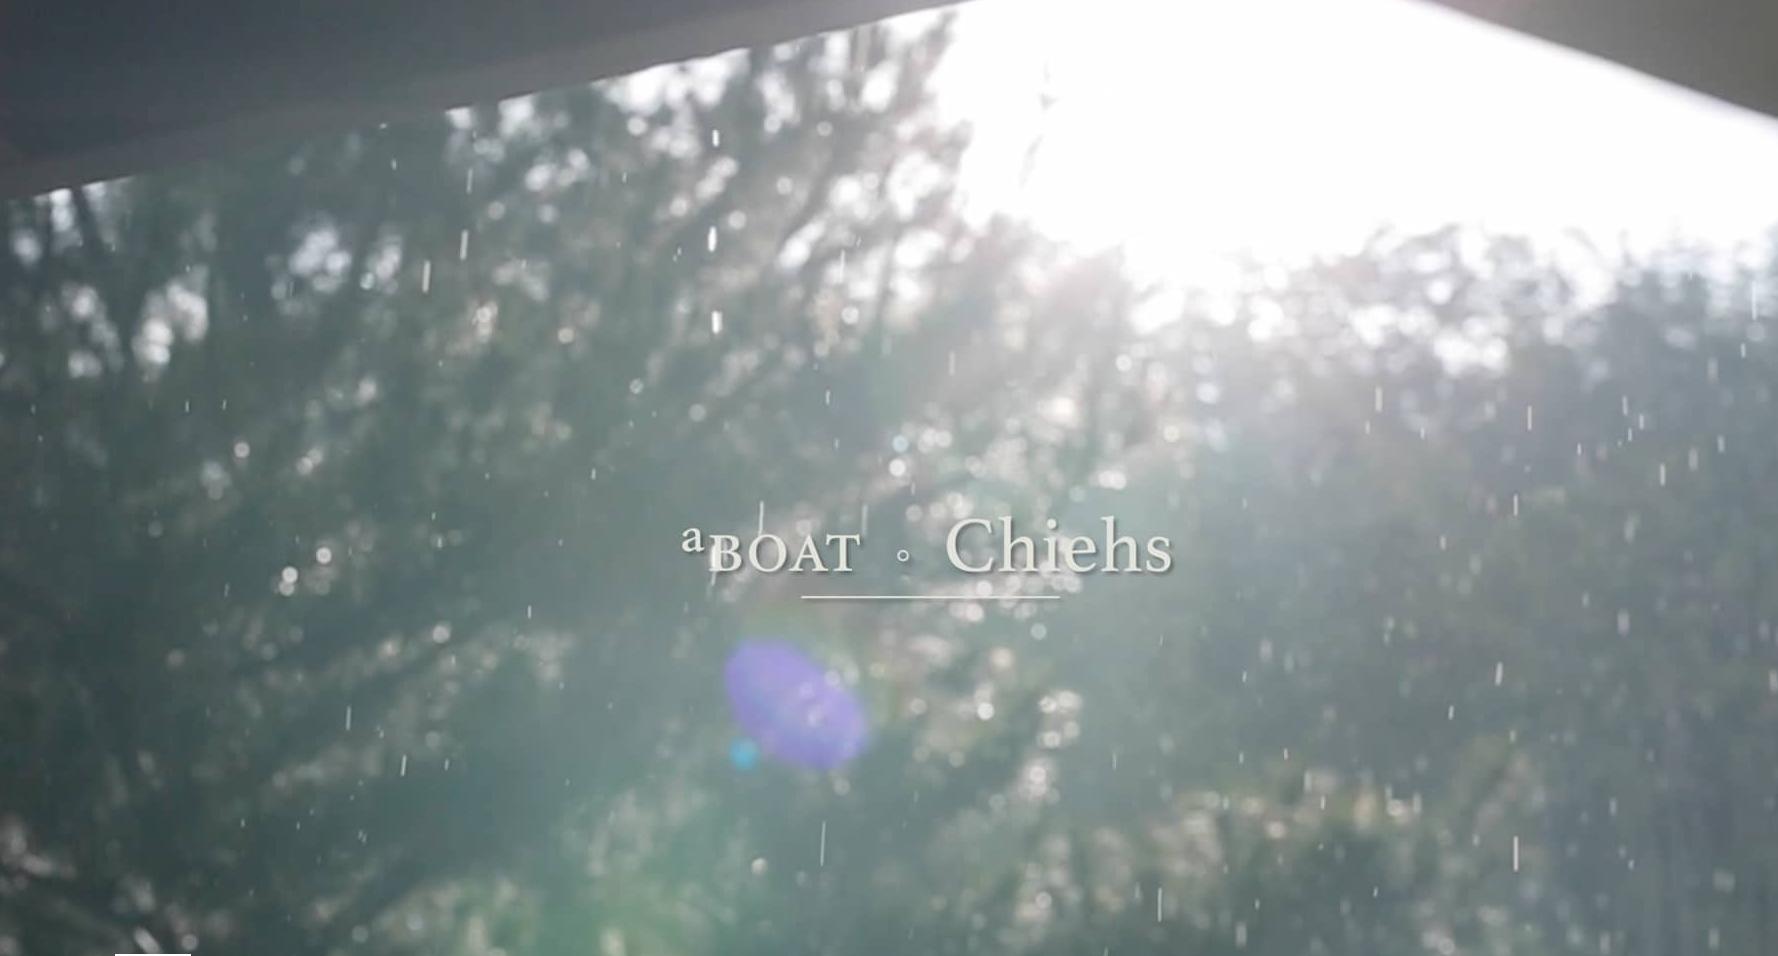 婚紗紀錄 |Chiehs